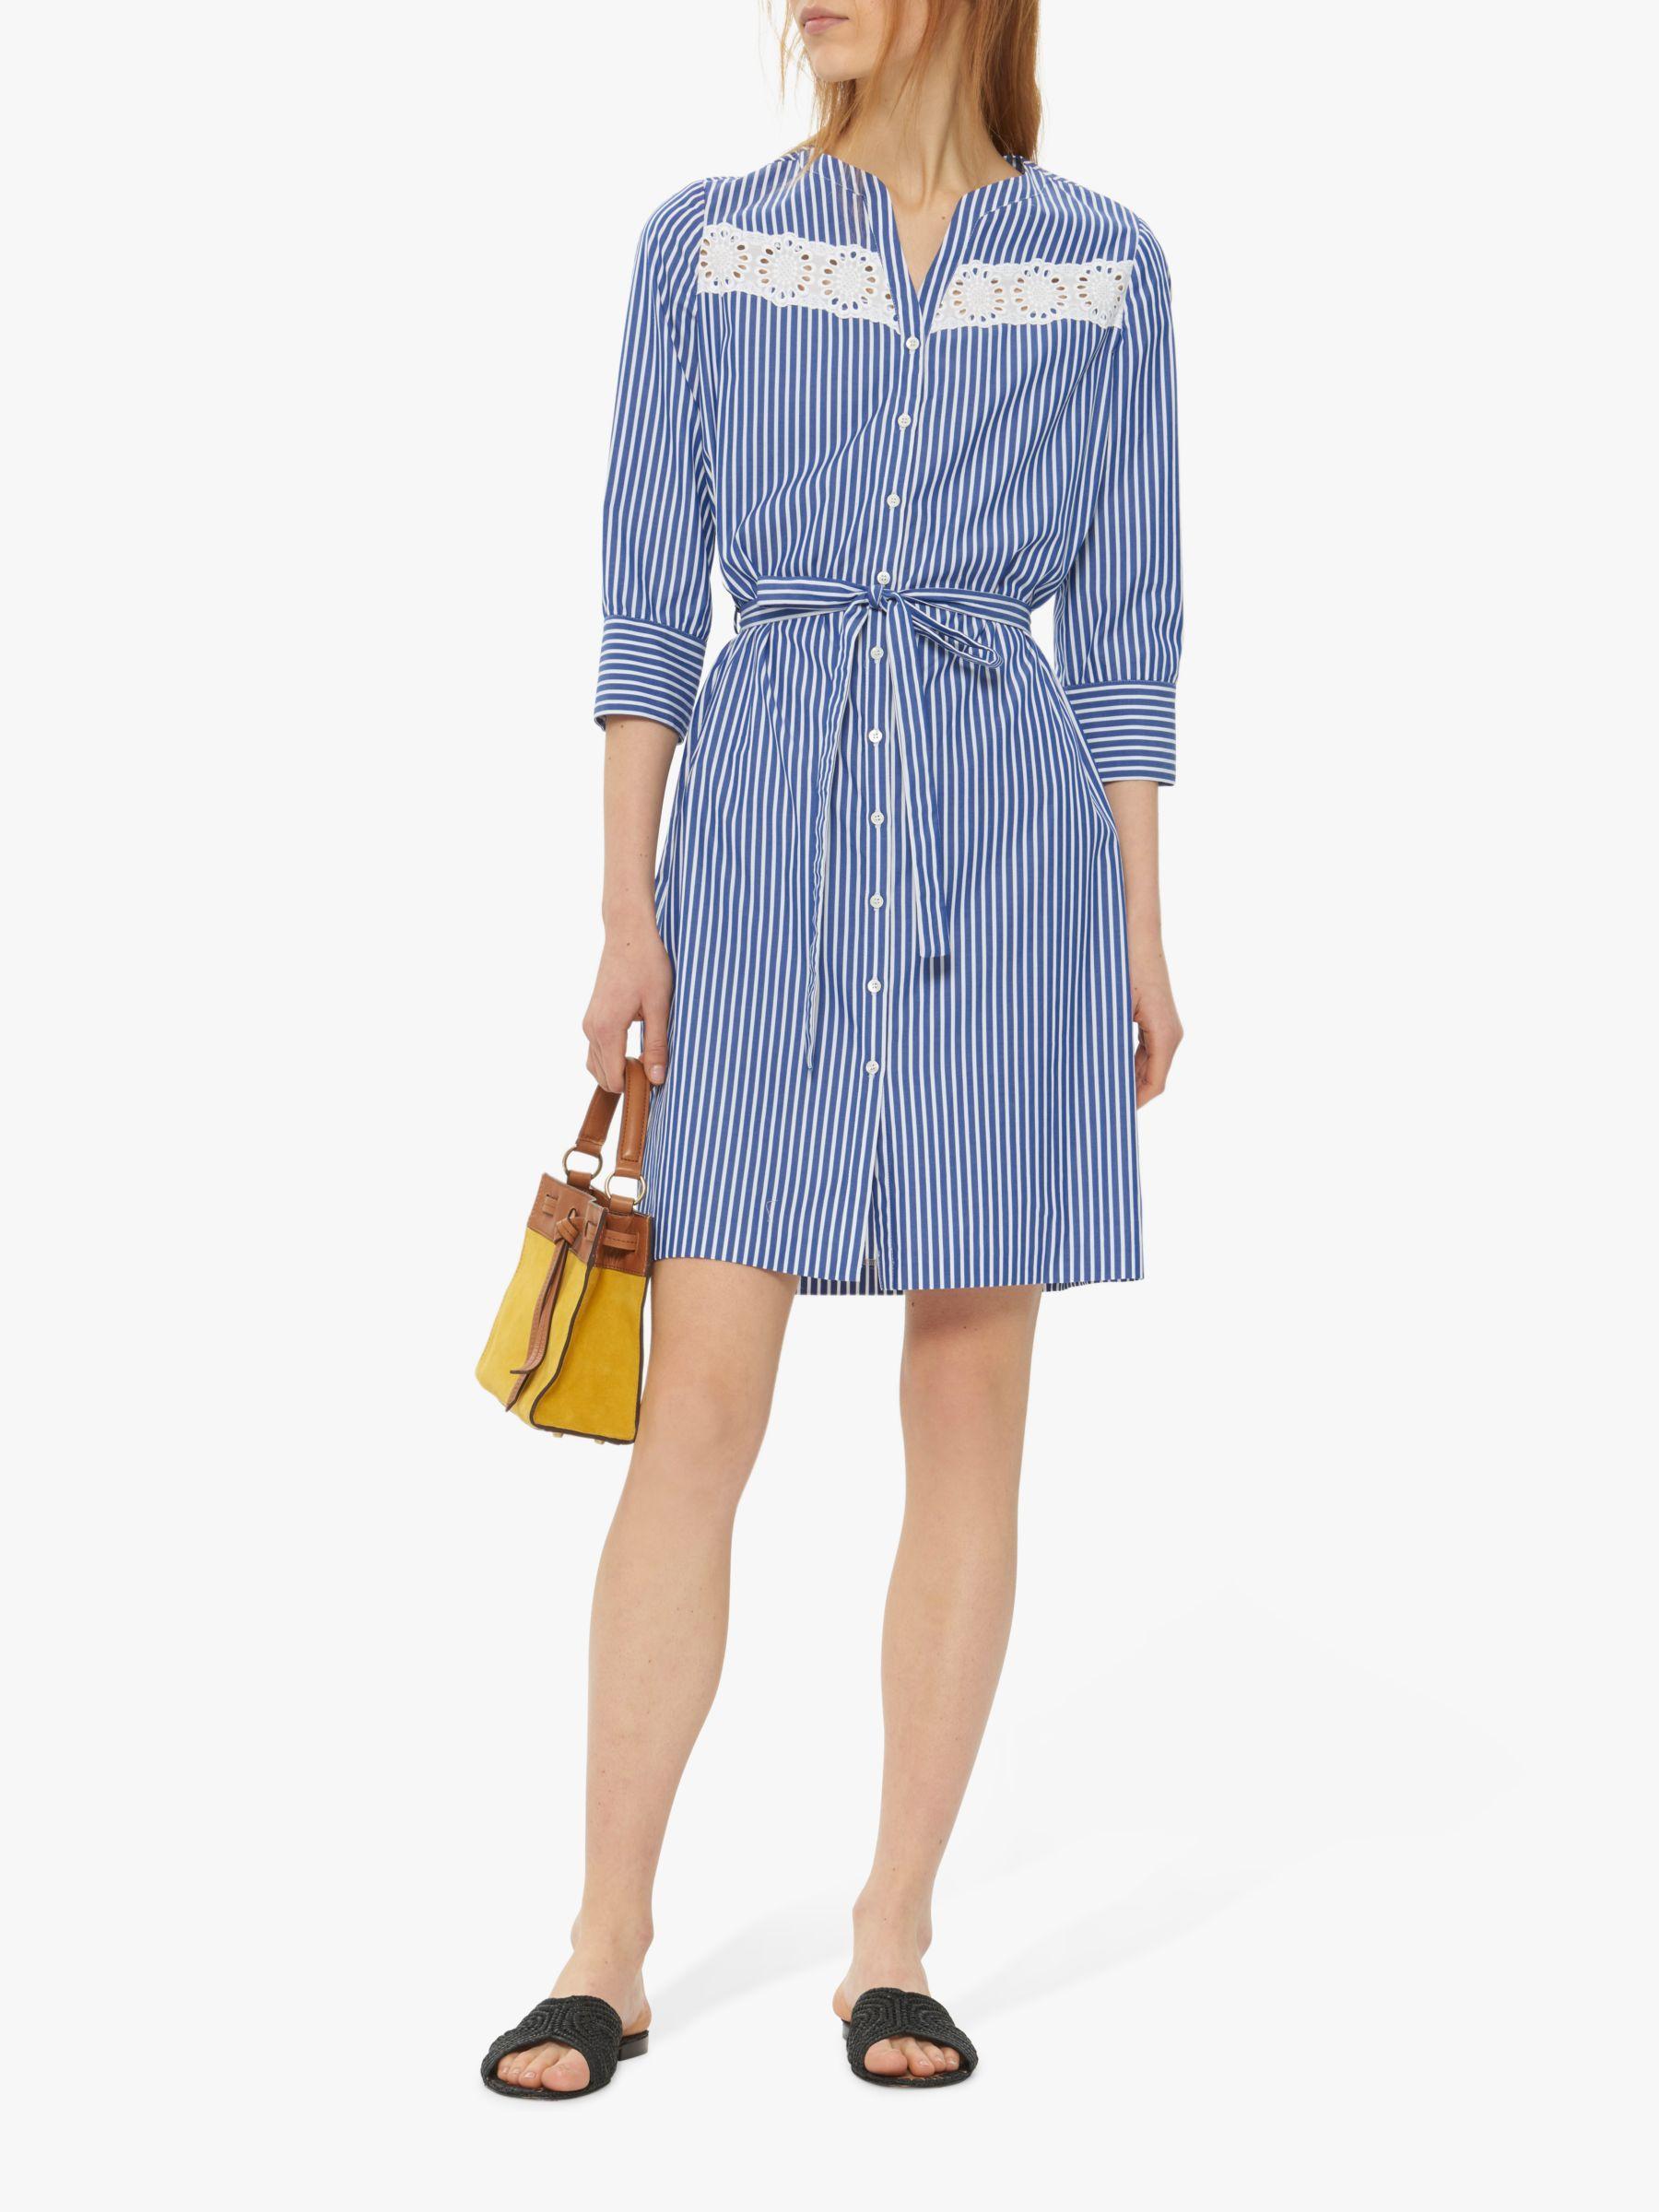 9d89a28450aecc Gerard Darel Ted Baker Gael Stripe Shirt Dress in Blue - Lyst